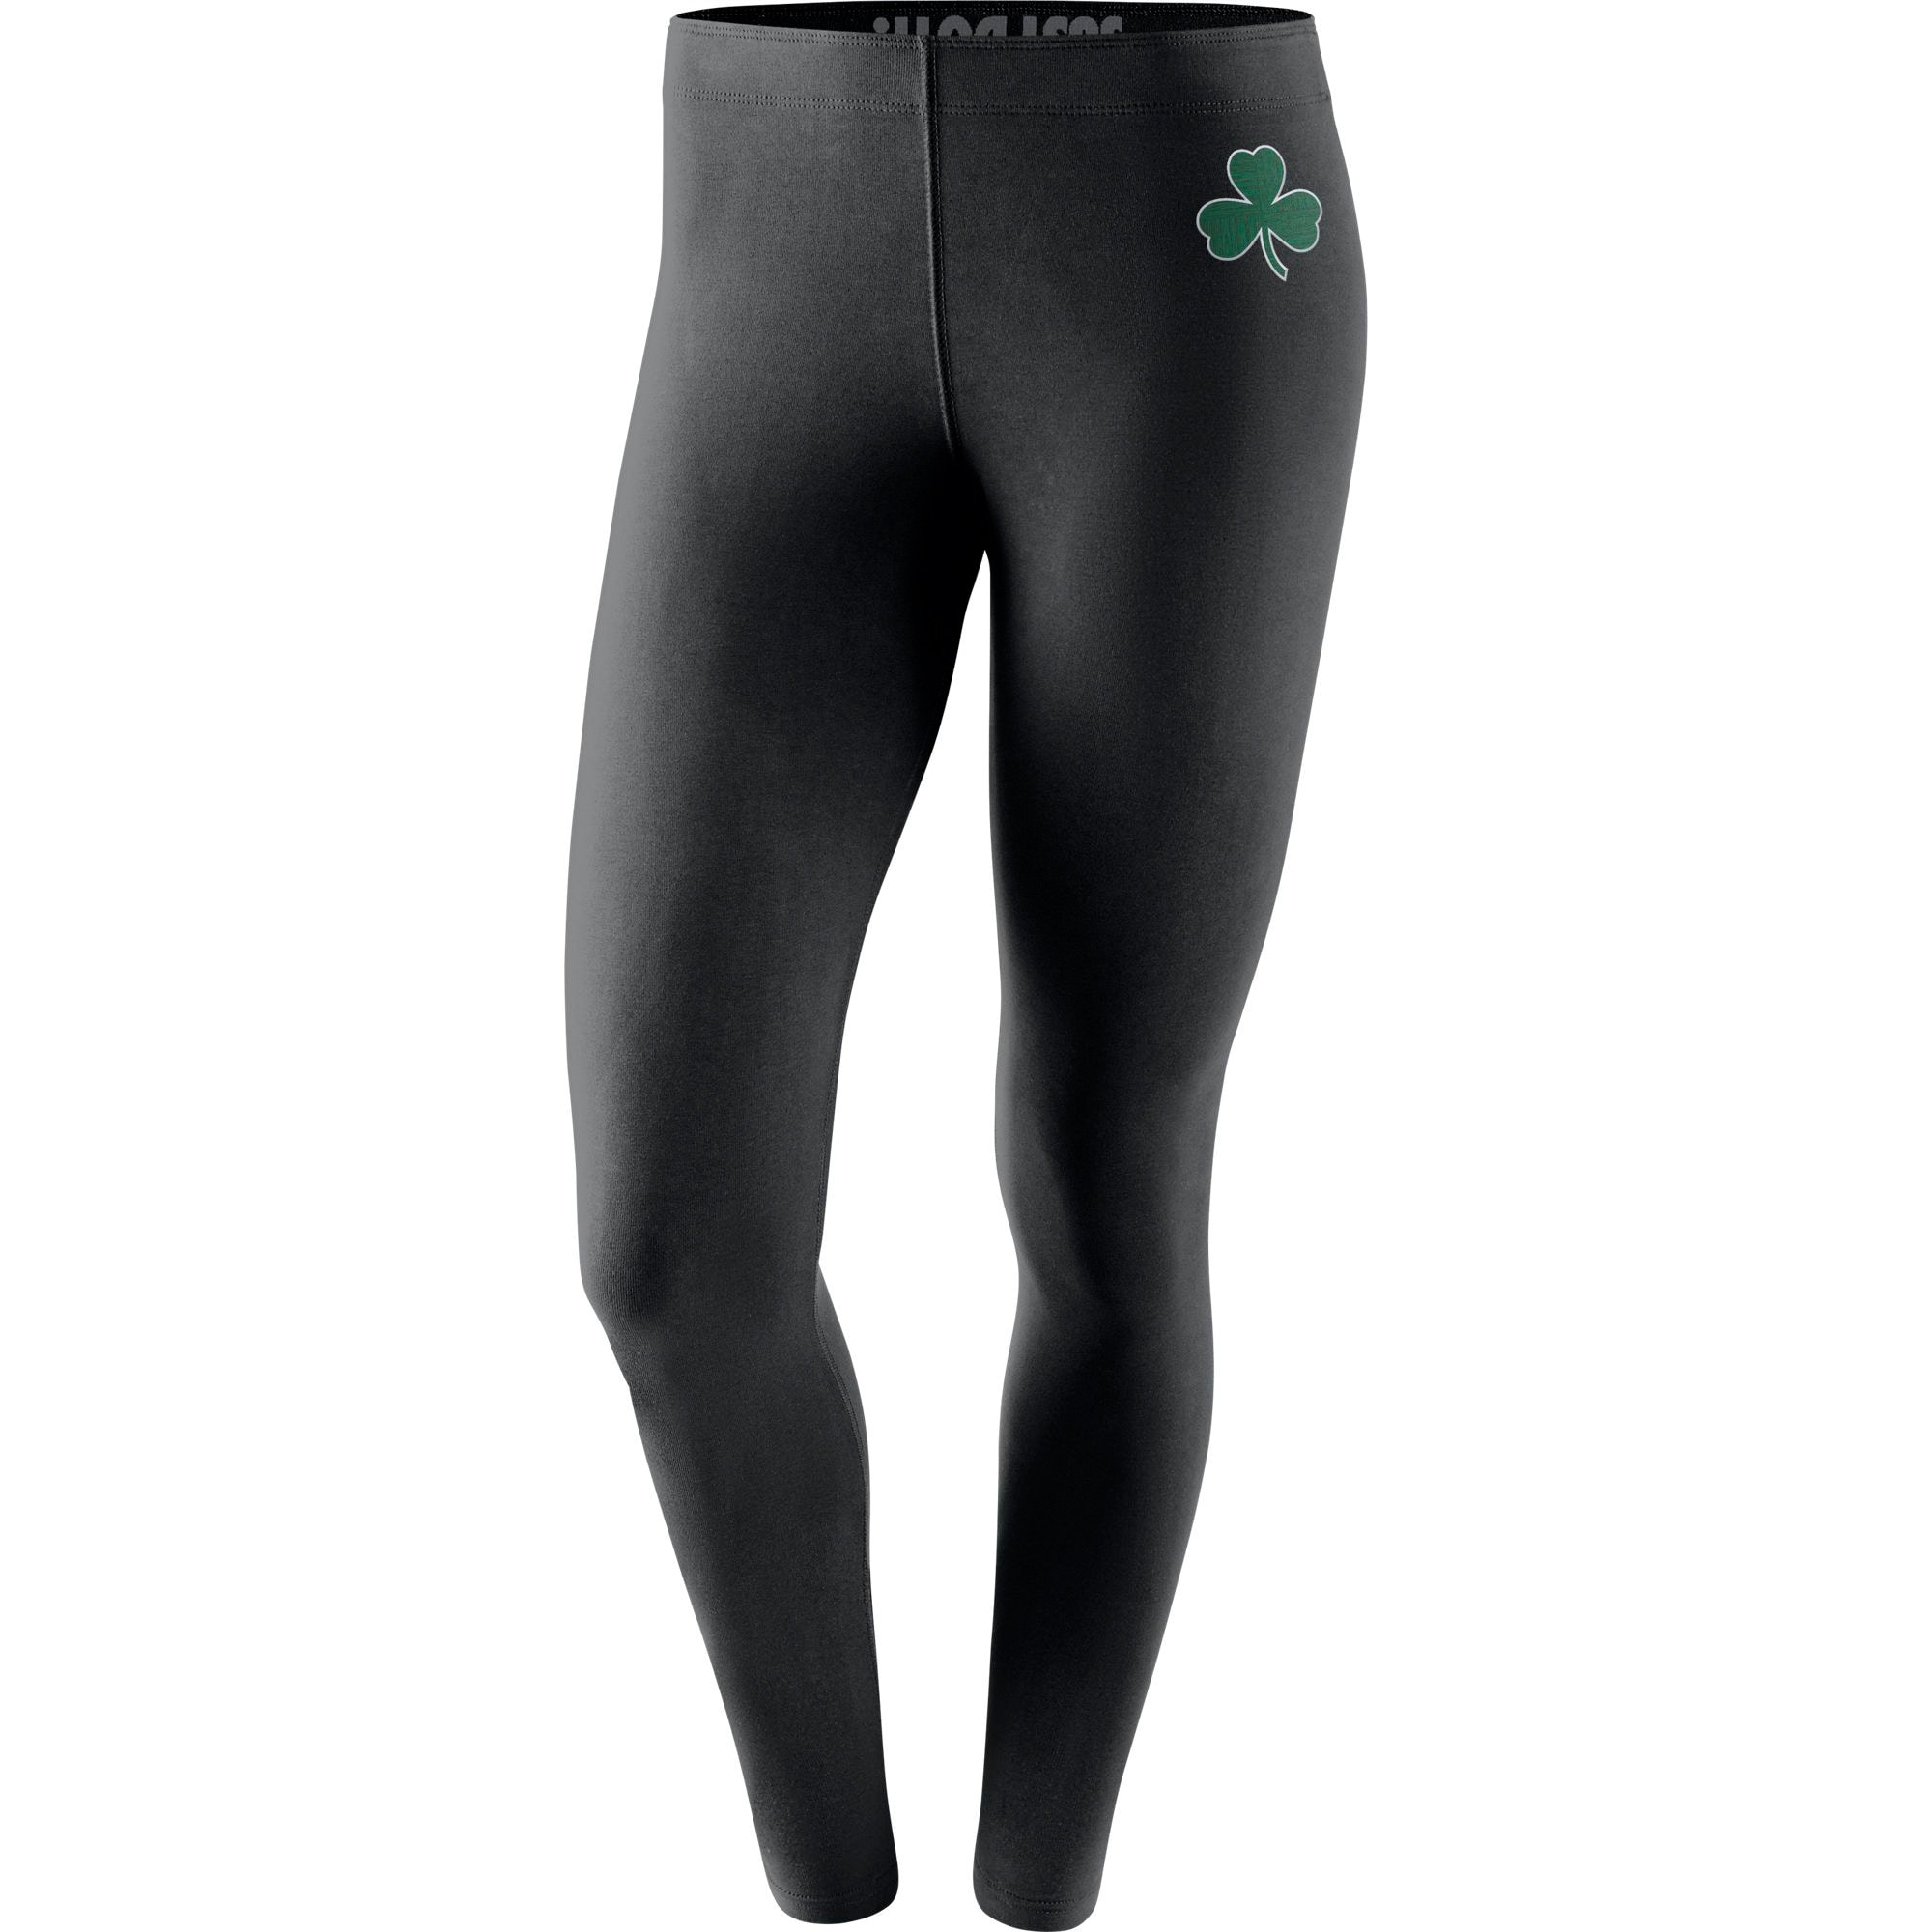 Boston Celtics Nike Women's City Edition Leg A See Tight - Black